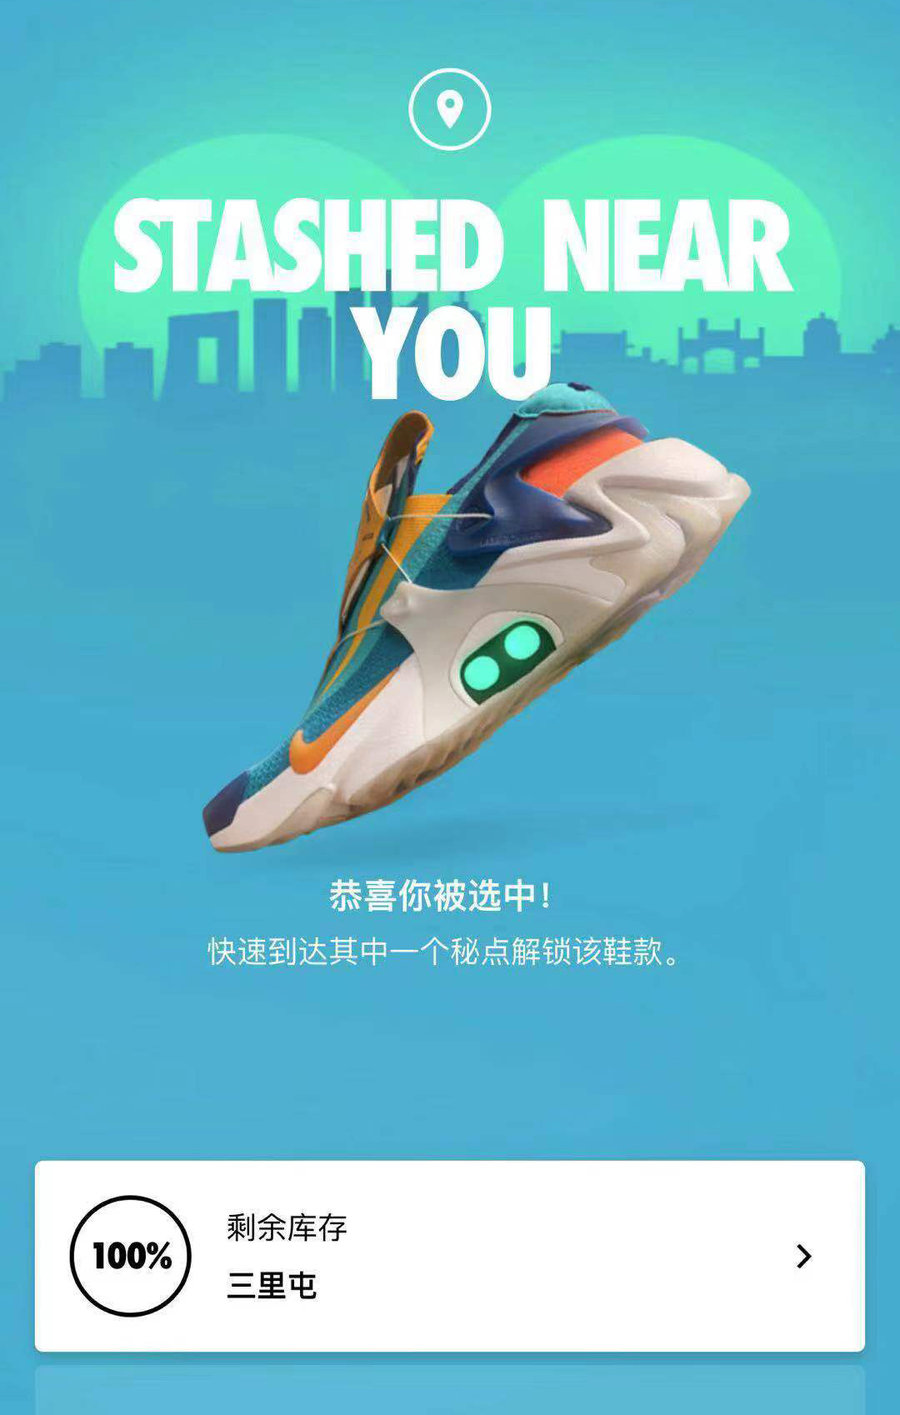 Nike,Adapt Huarache,BV6397-300 秘点发售的全新 Adapt Huarache 登场!将于下周发售